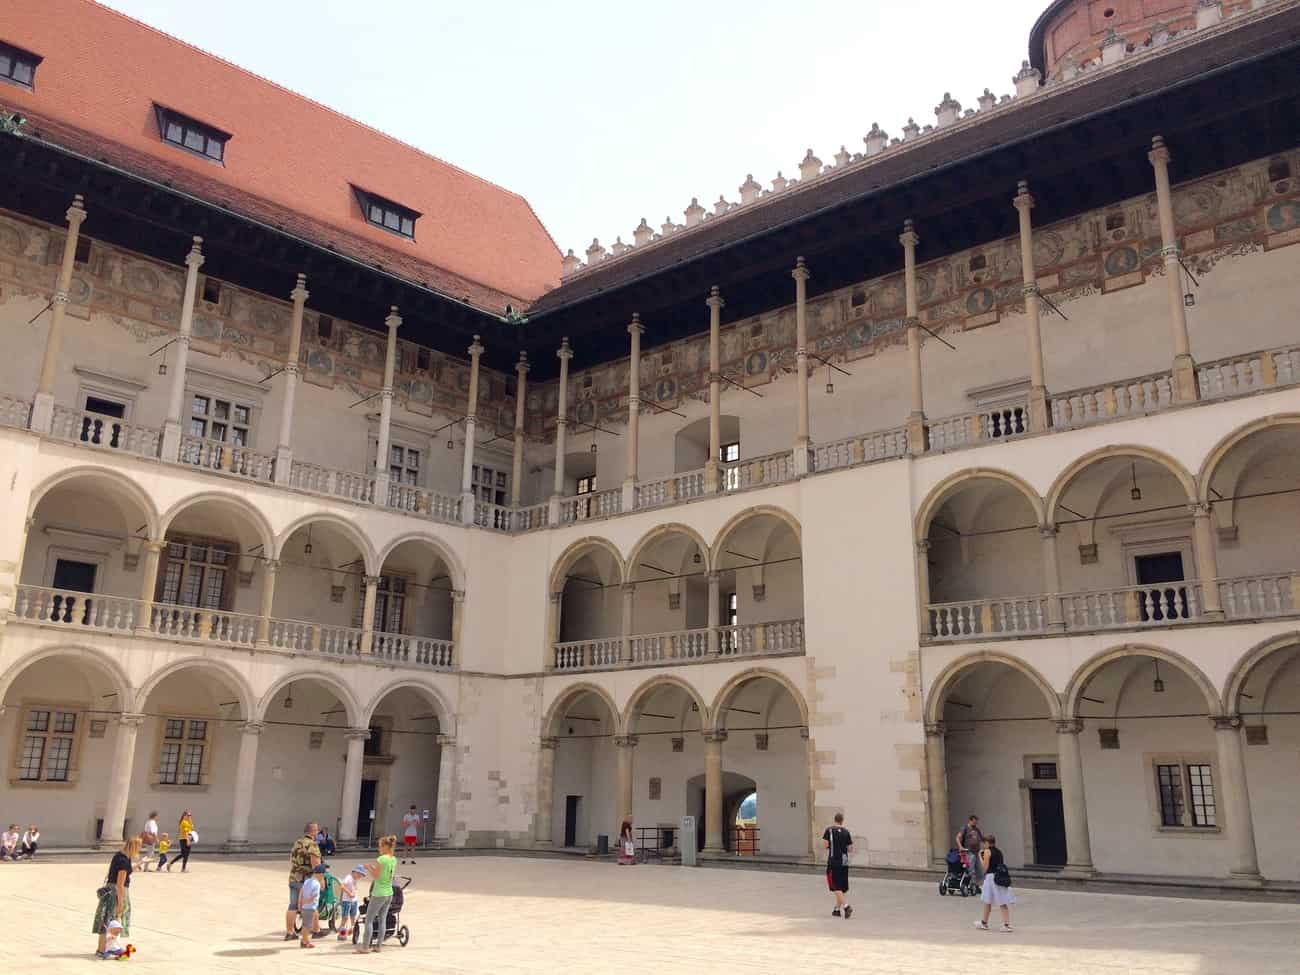 Poland Krakow Wawel Castle Arcaded Courtyard